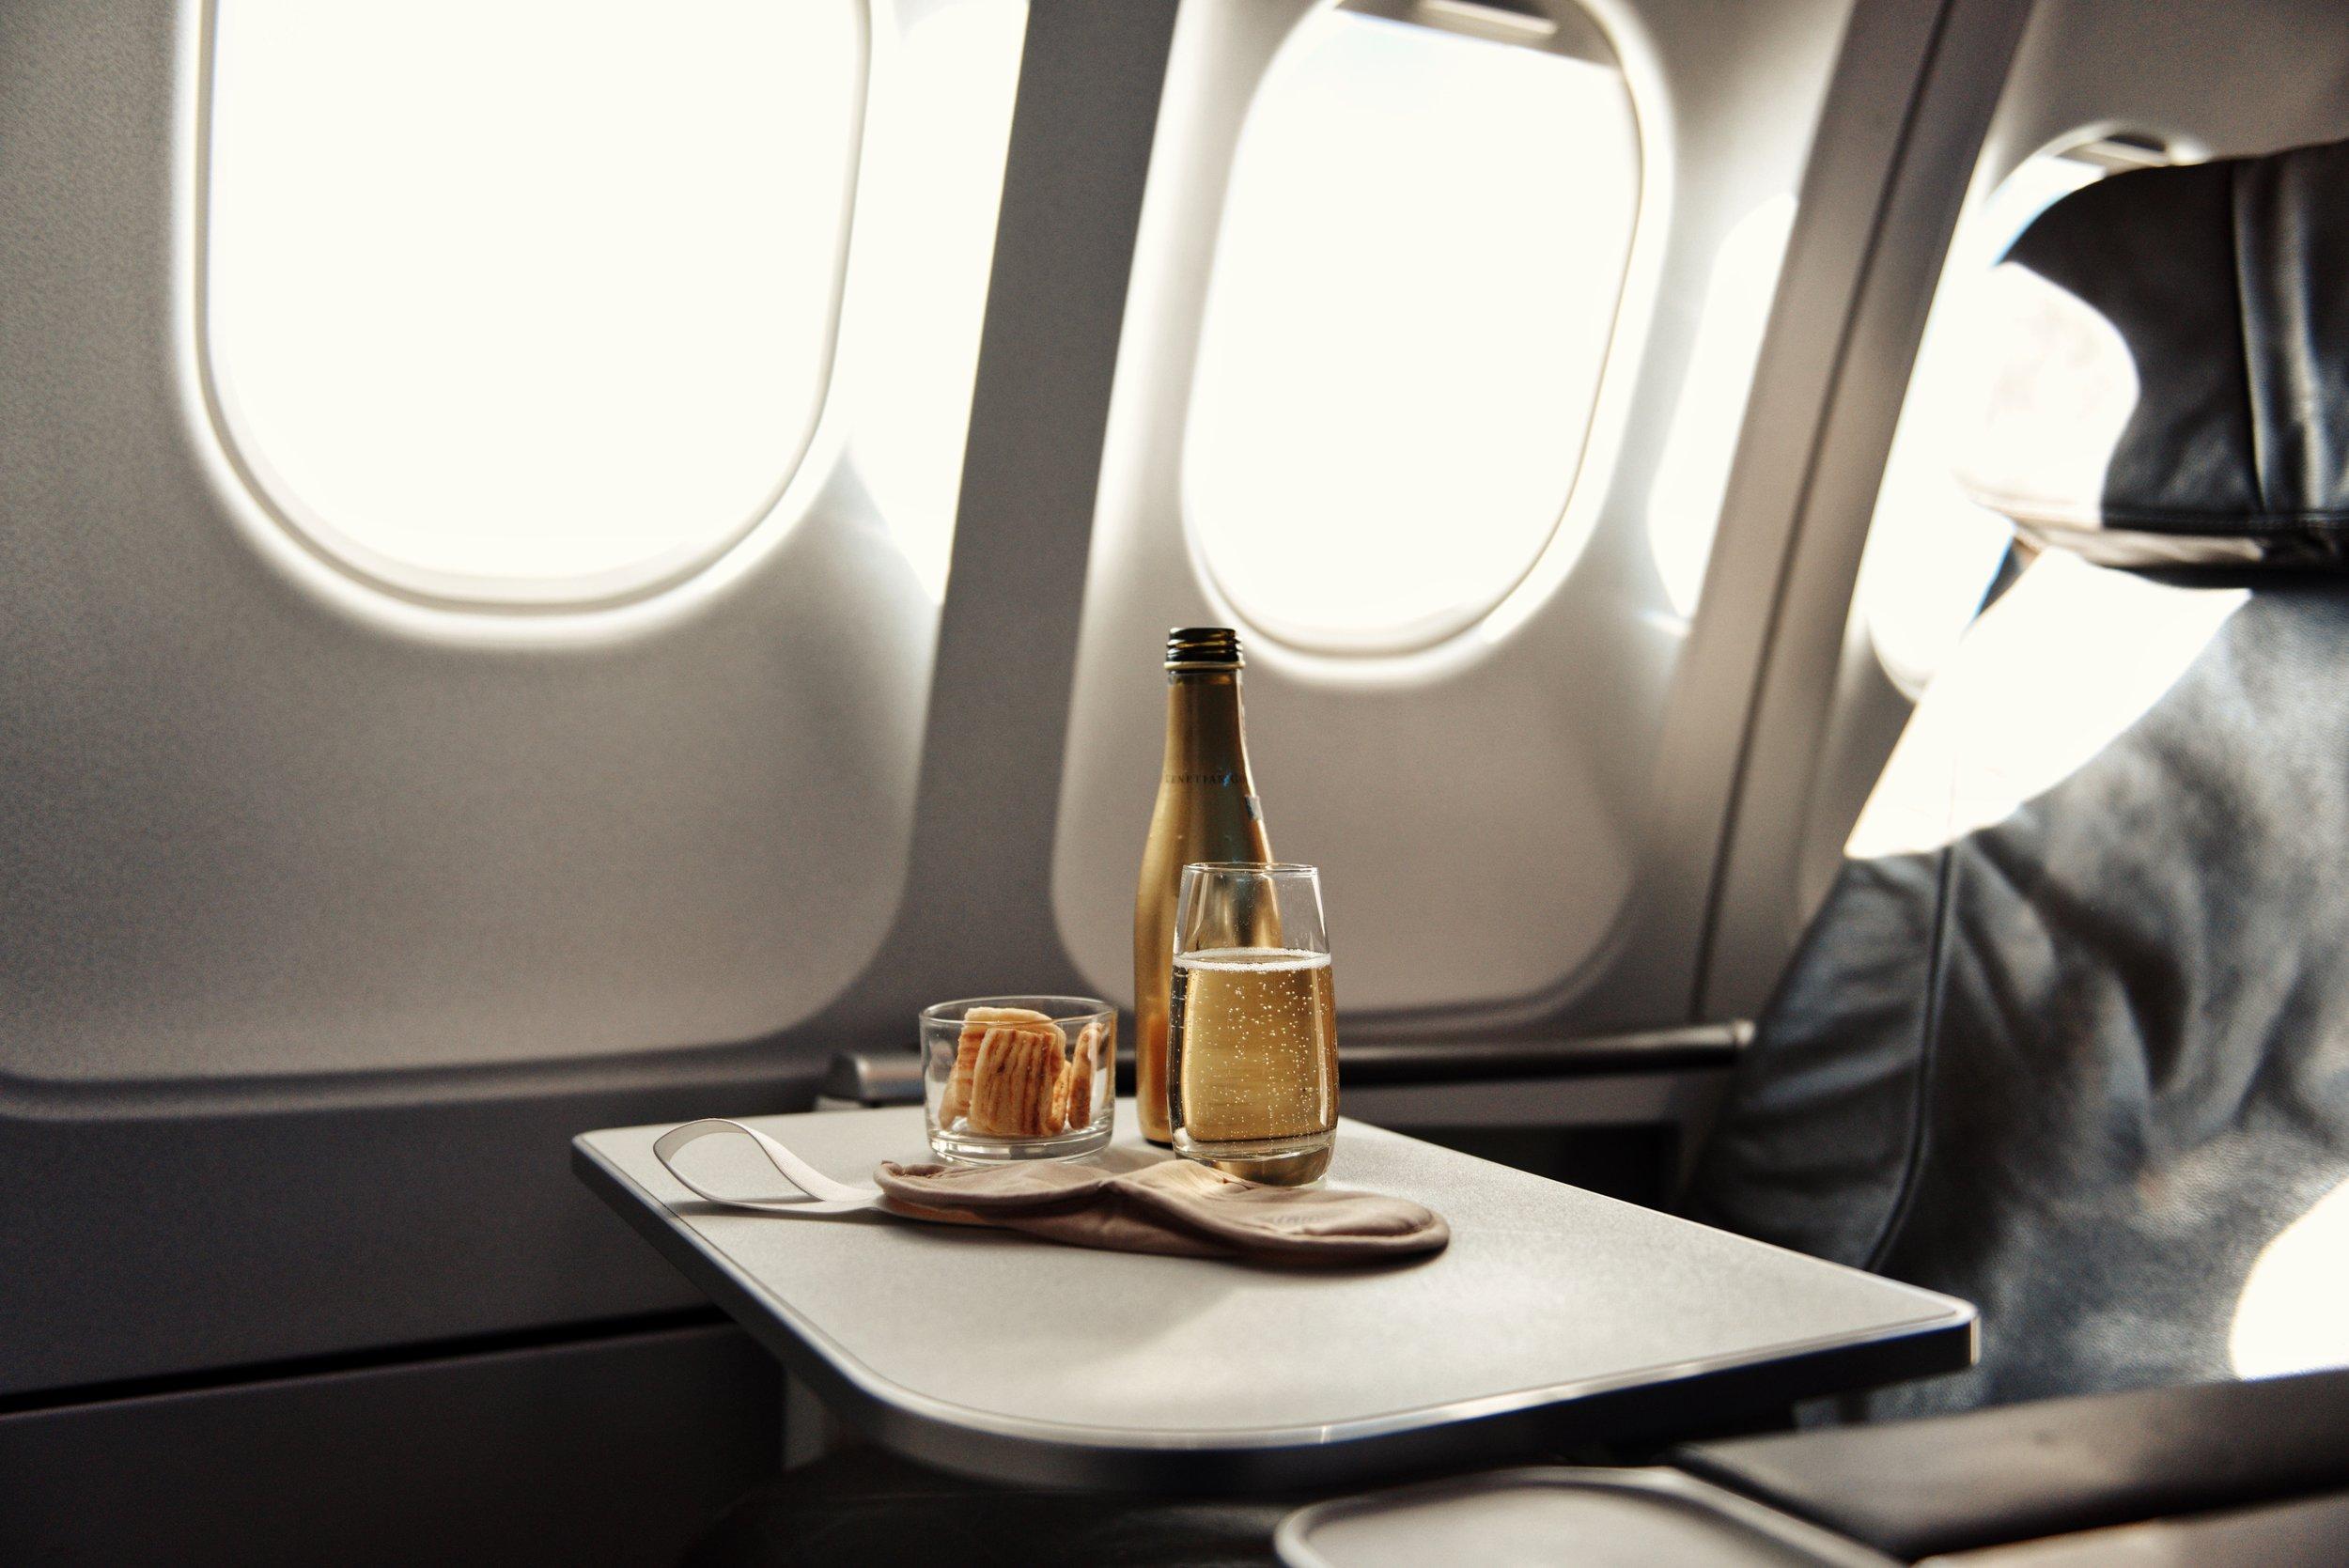 Air Transat Jamaica luxury collection